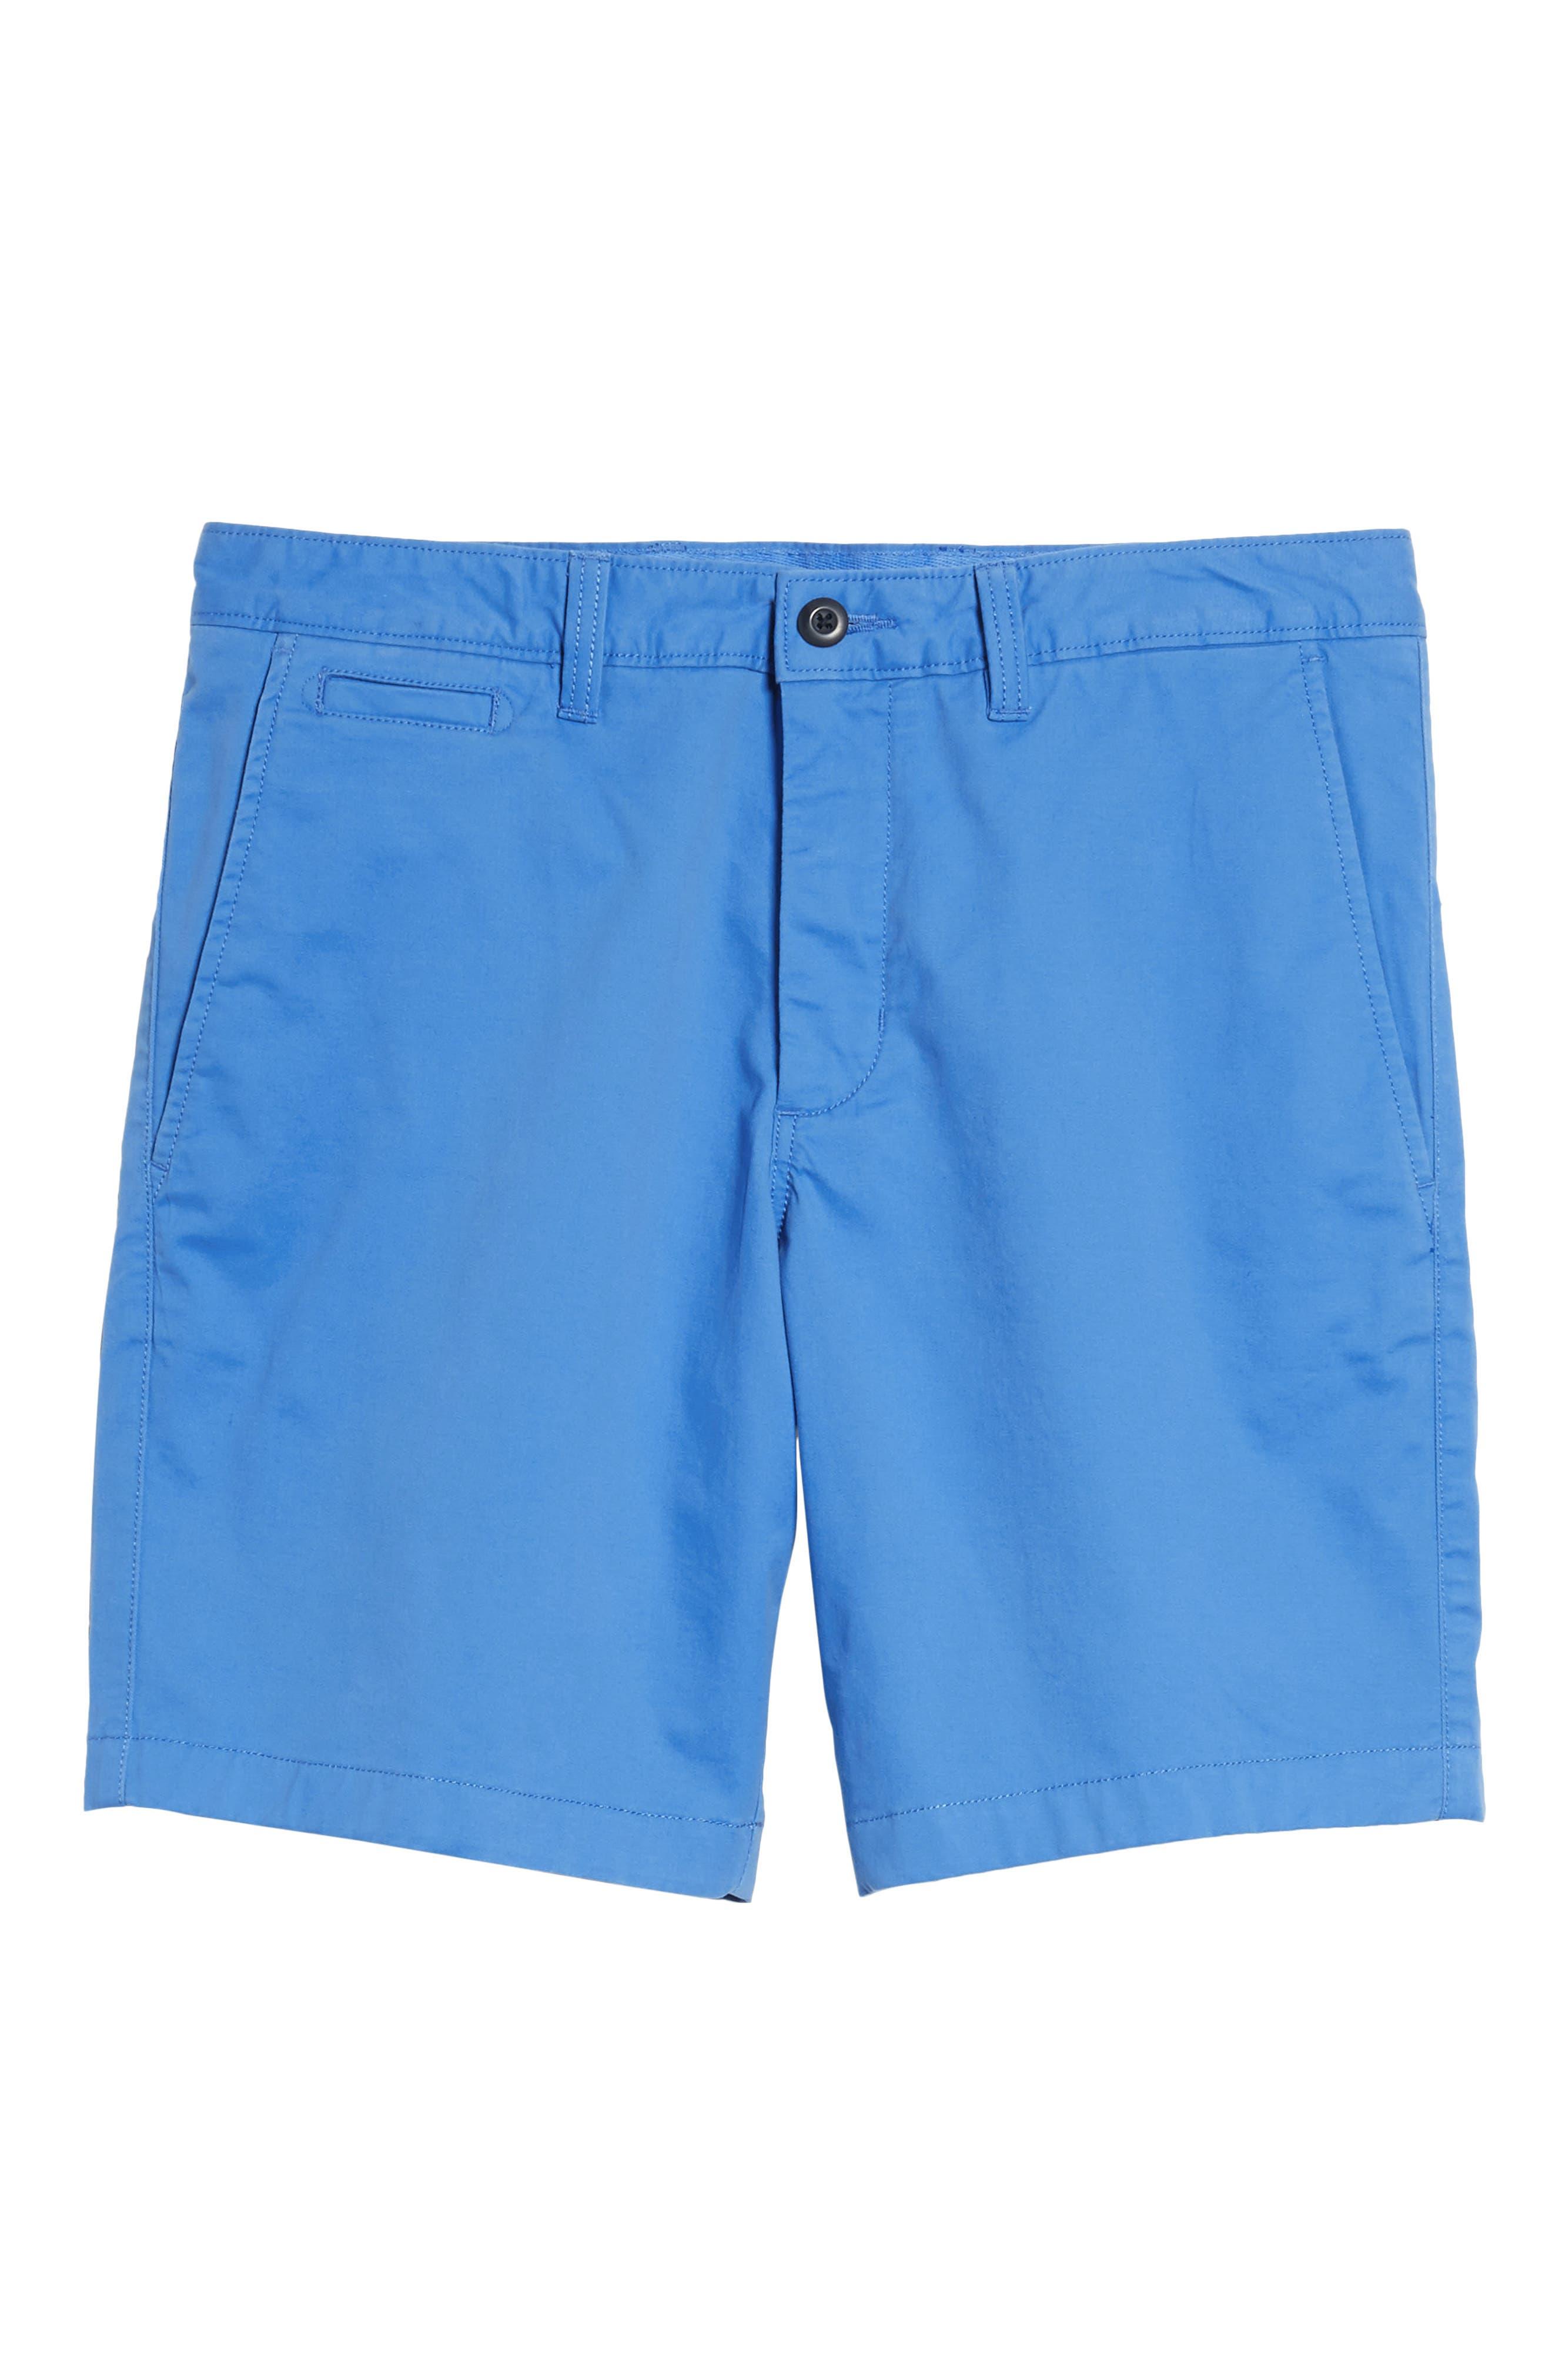 Ballard Slim Fit Stretch Chino 9-Inch Shorts,                             Alternate thumbnail 69, color,